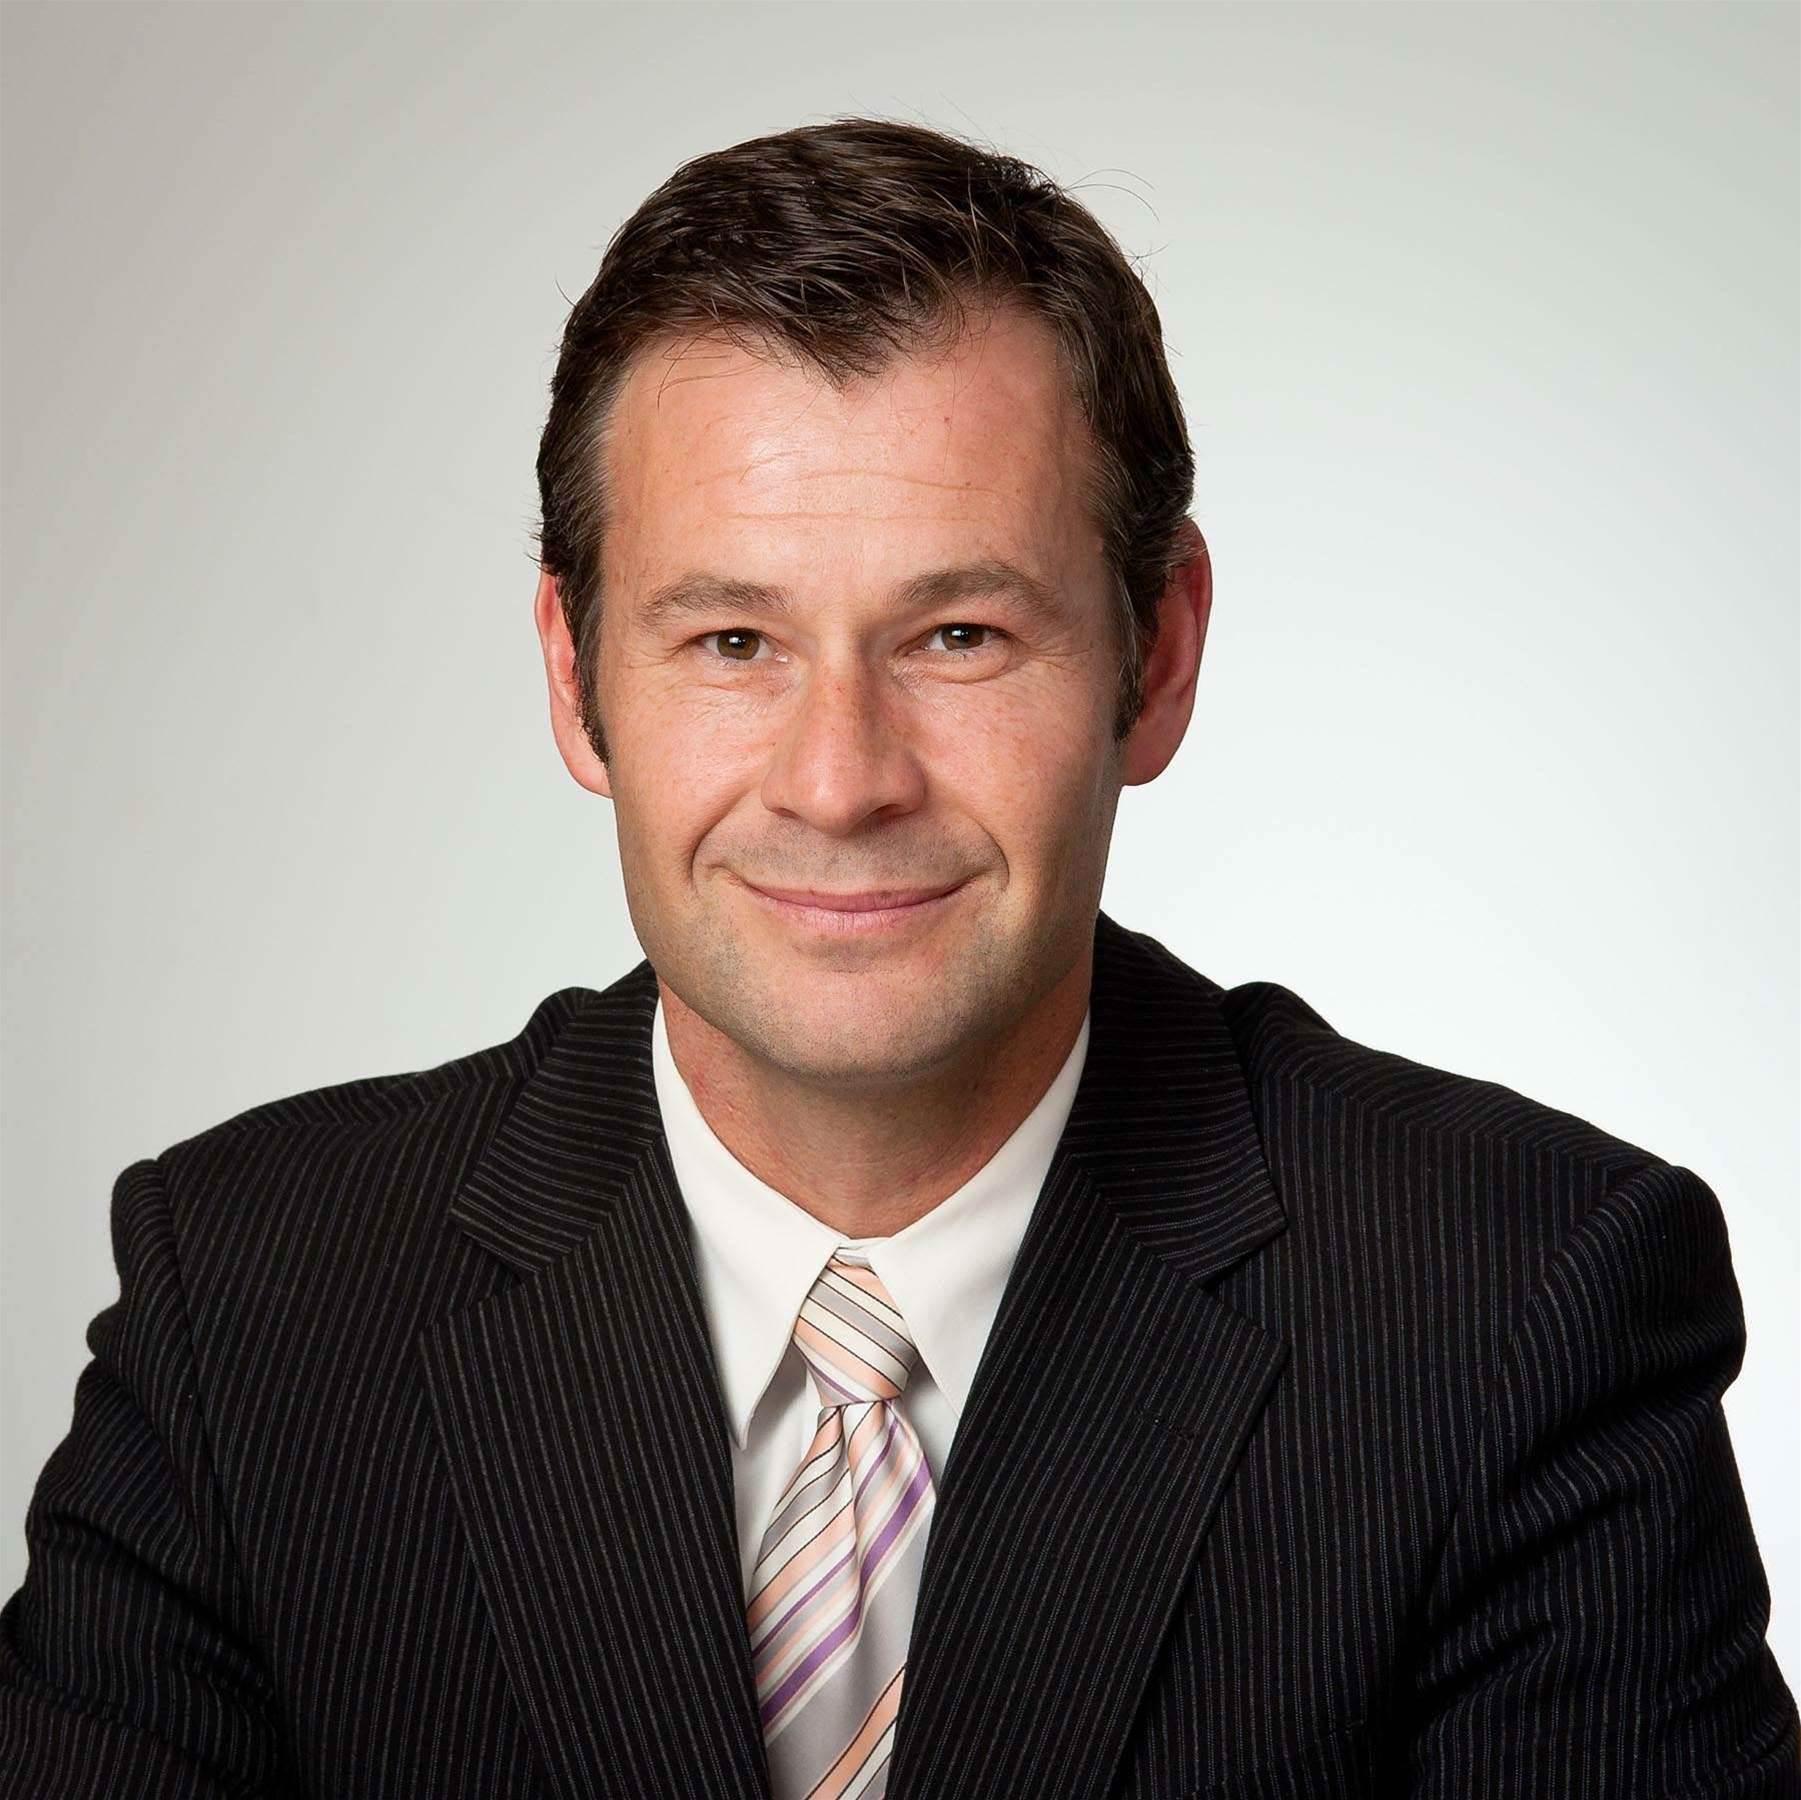 Treasury picks TechOne for ERP overhaul